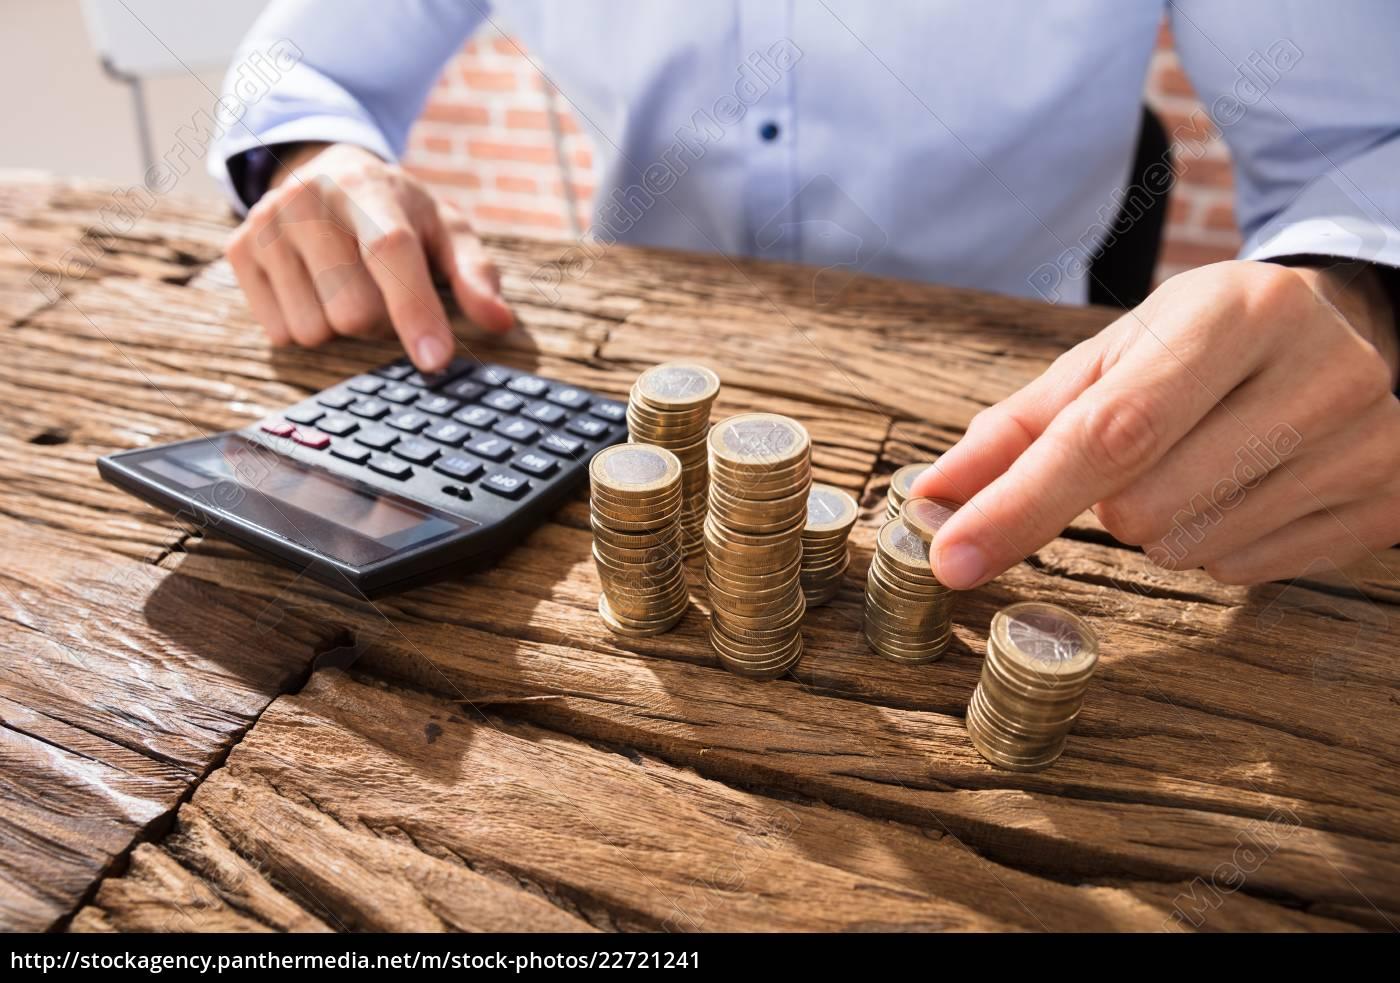 person, calculating, using, calculator - 22721241